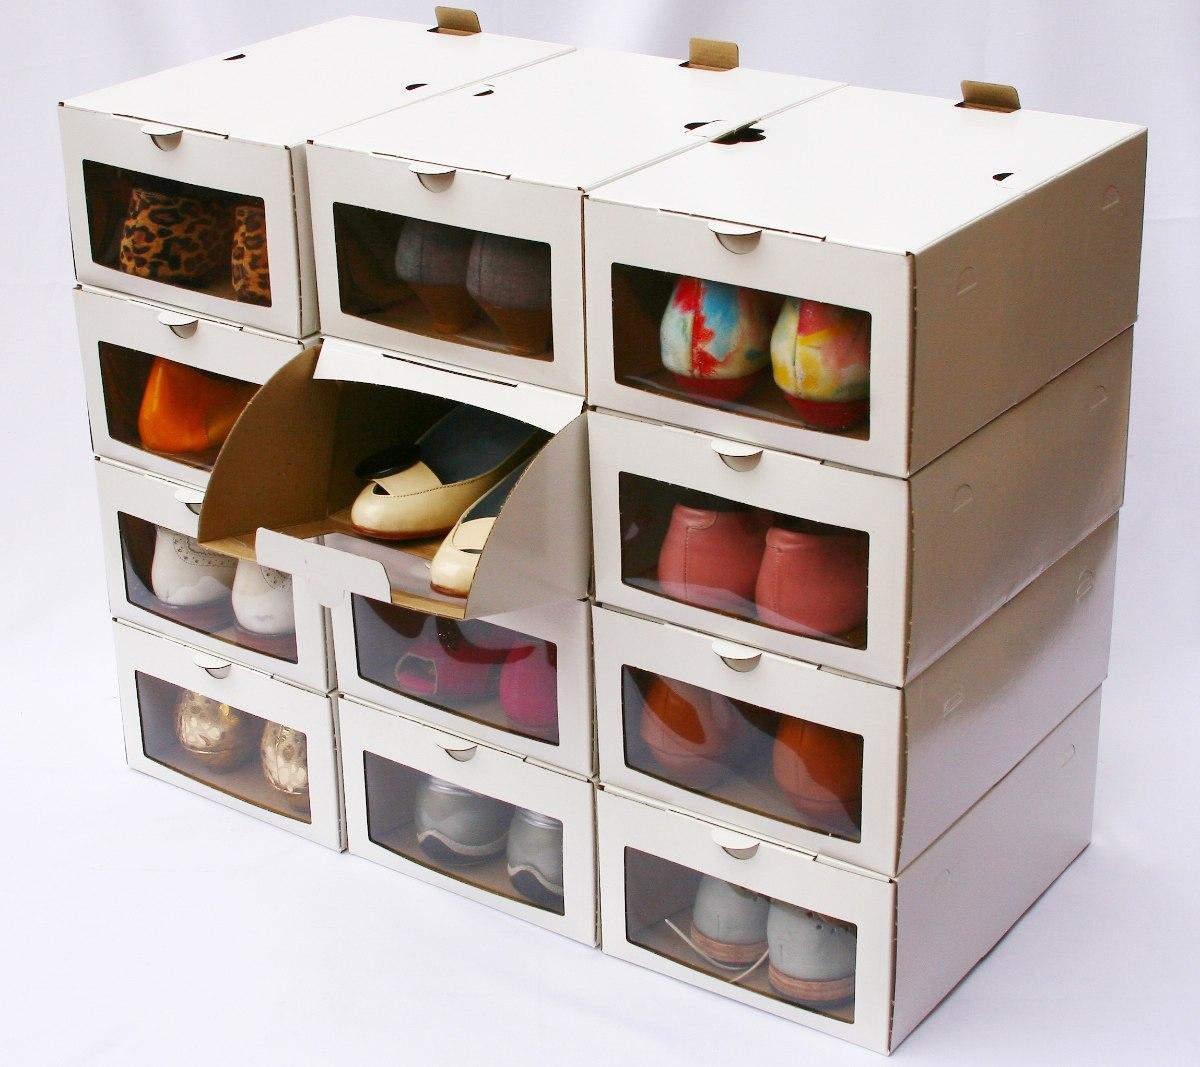 Para Botas Caja Cajas 6 12 Zapatos 2eIDH9WEY